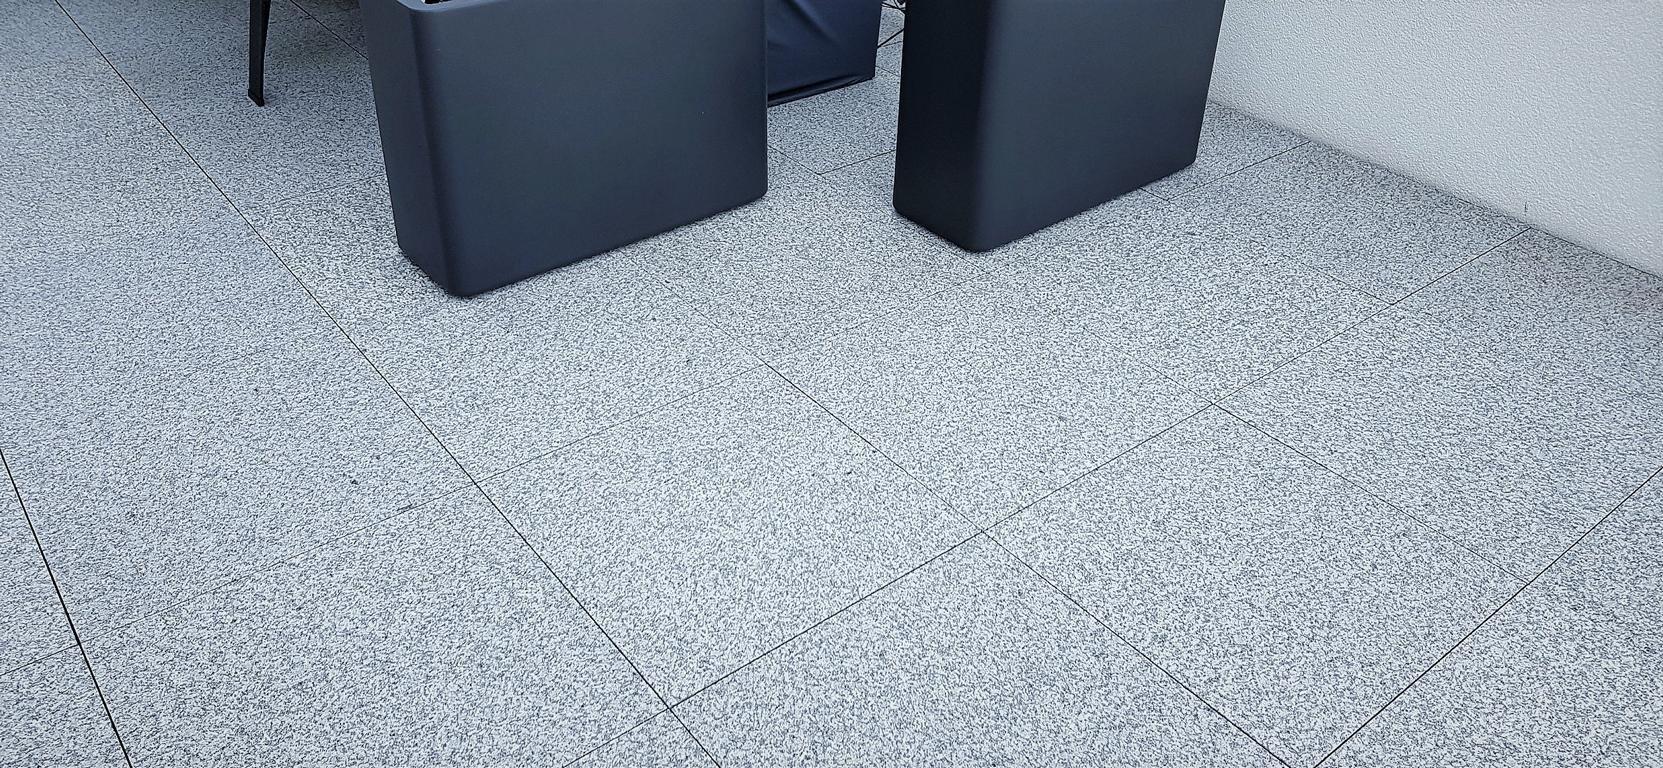 Aalfanger Bodenplatten4